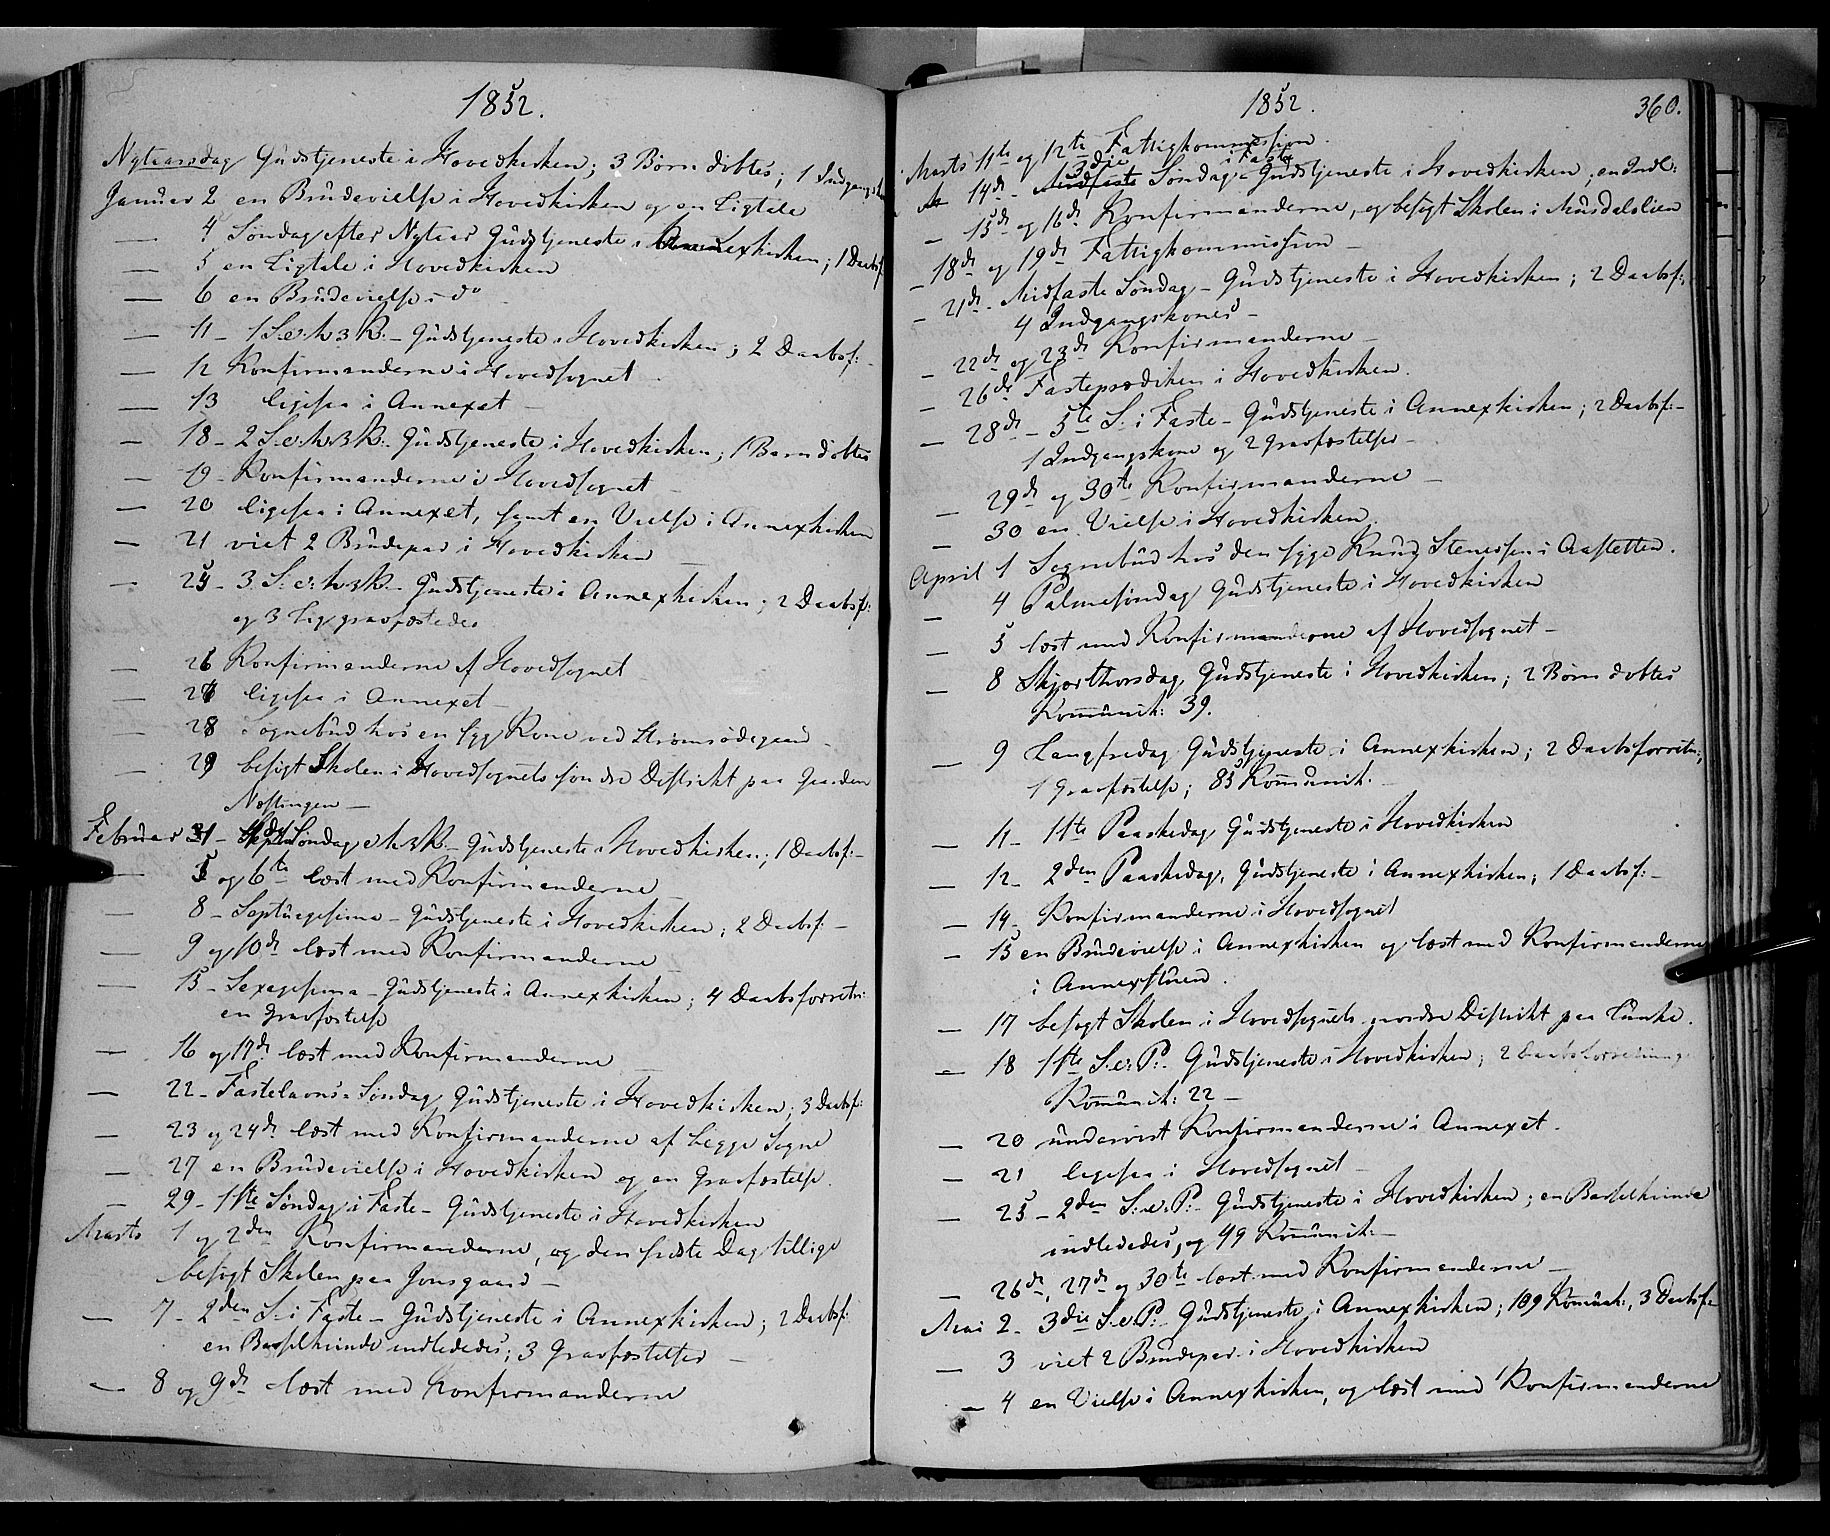 SAH, Øyer prestekontor, Ministerialbok nr. 5, 1842-1857, s. 360